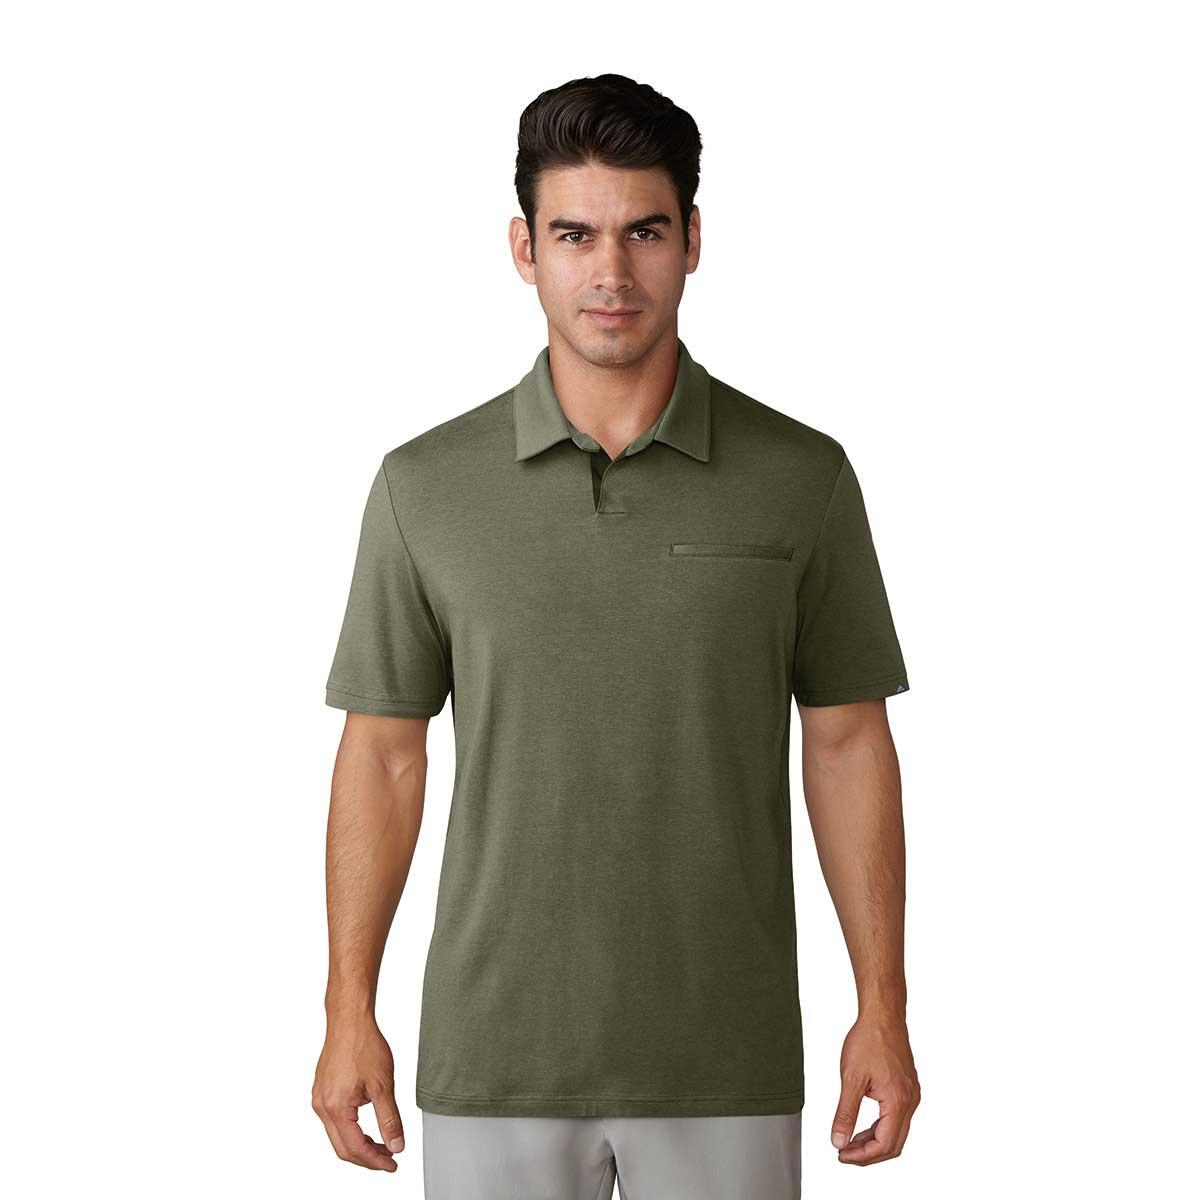 Adidas Adicross Johnny Collar Golf Polo - Olive